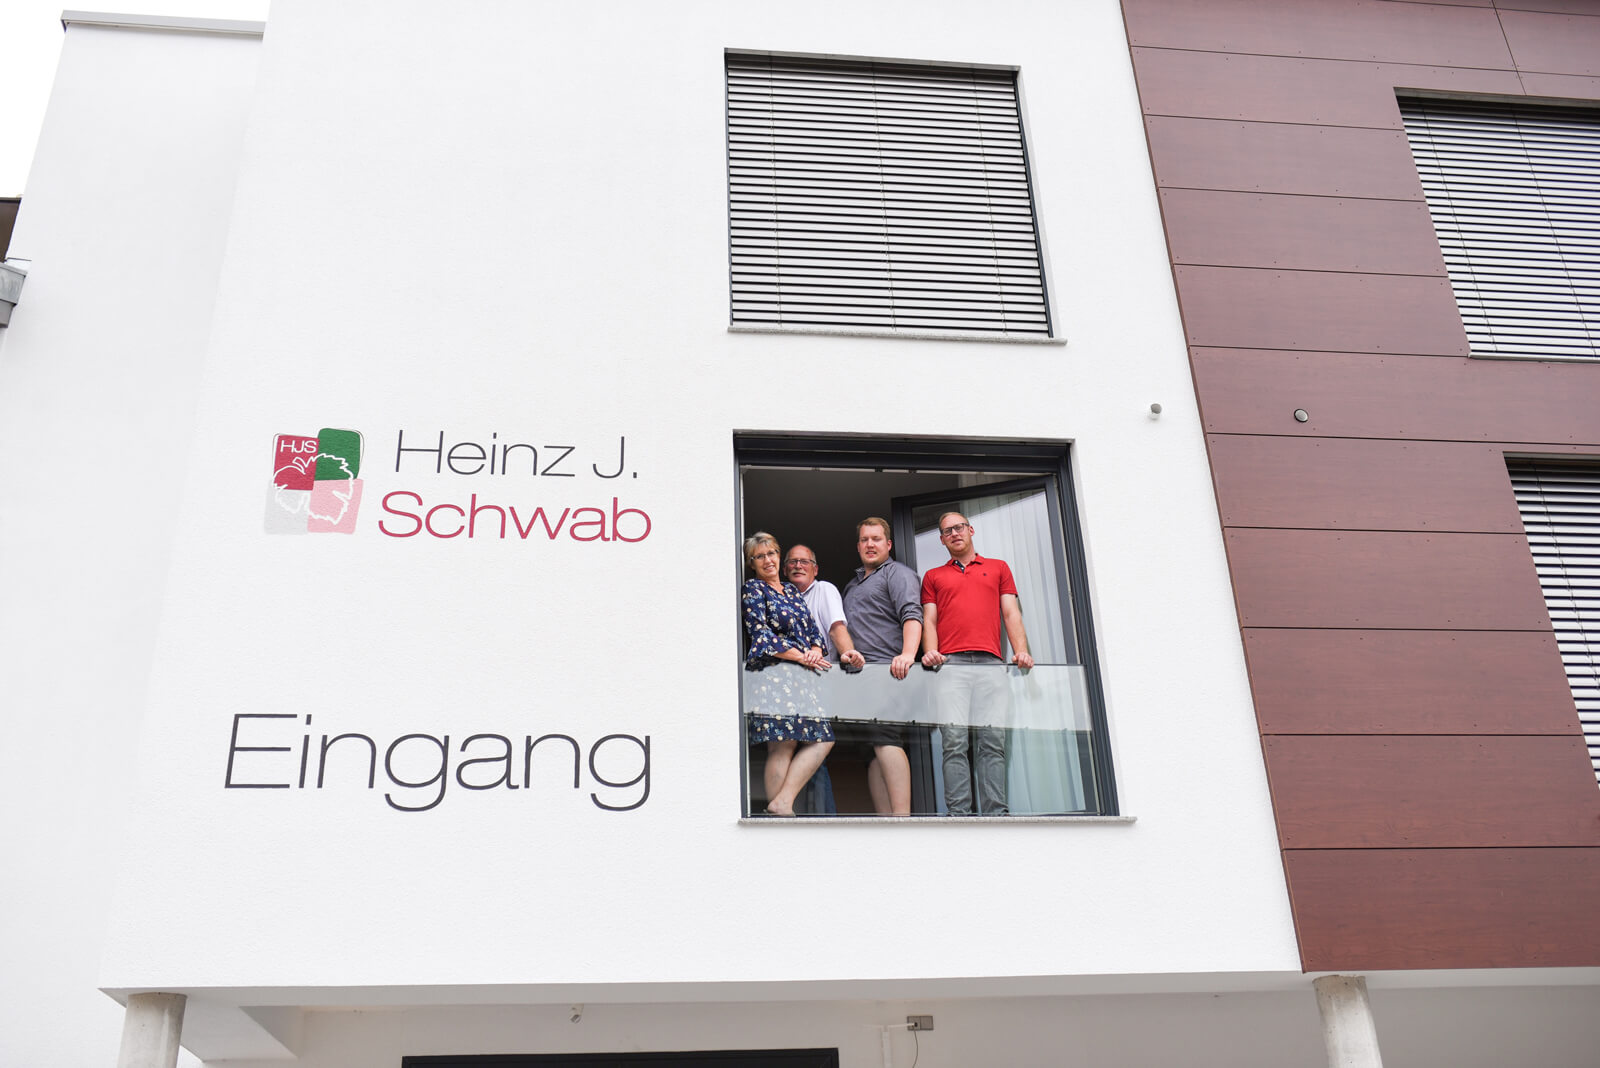 Bretzfeld_Weingut Vinotel Schwab (2)